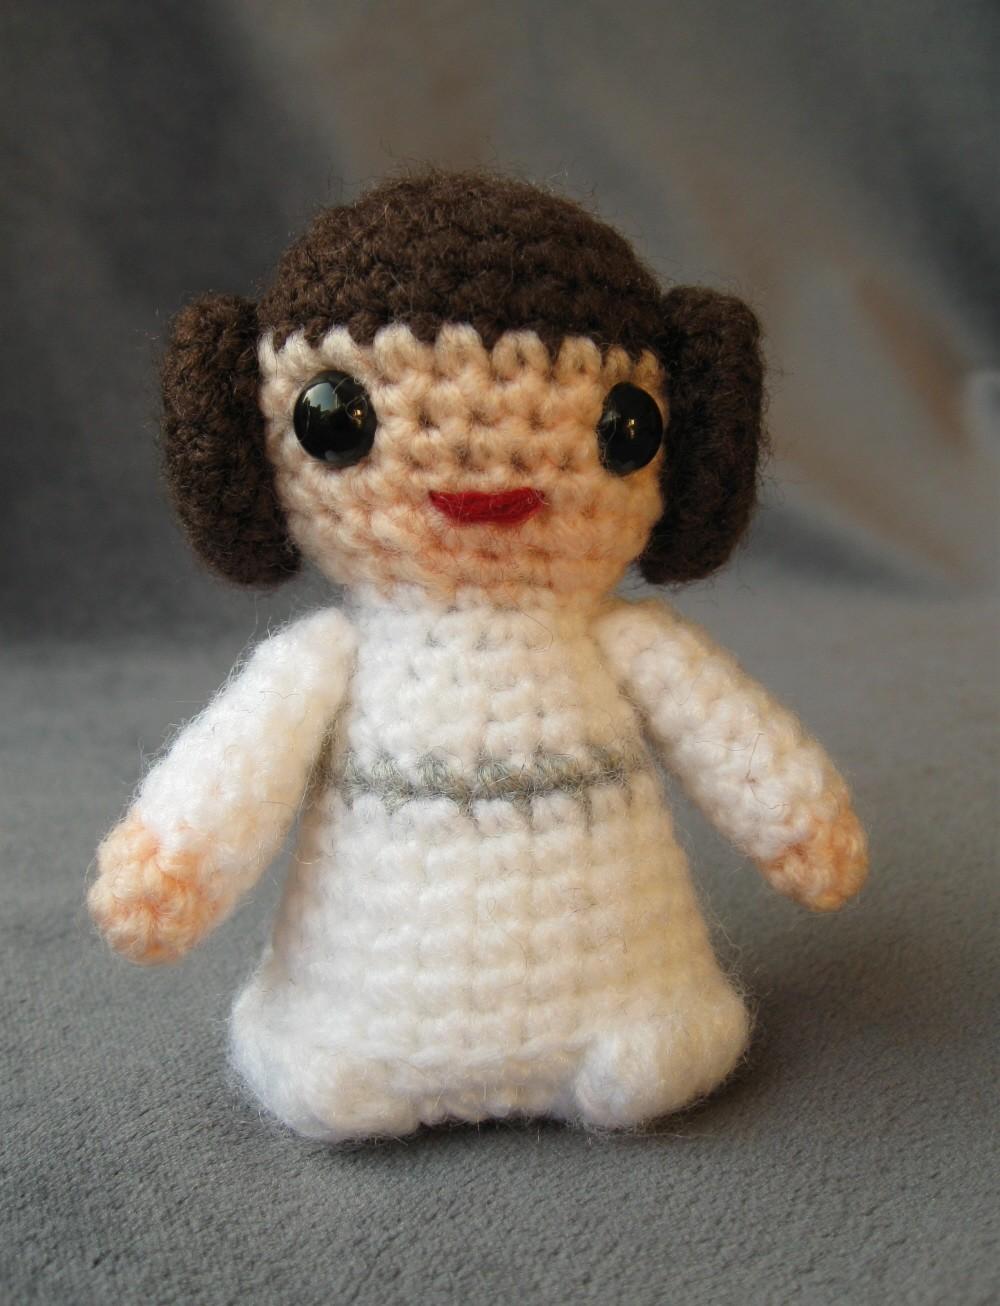 Star Wars Amigurumi : Mini Star Wars Amigurumi Cuddly Is Finally Cool